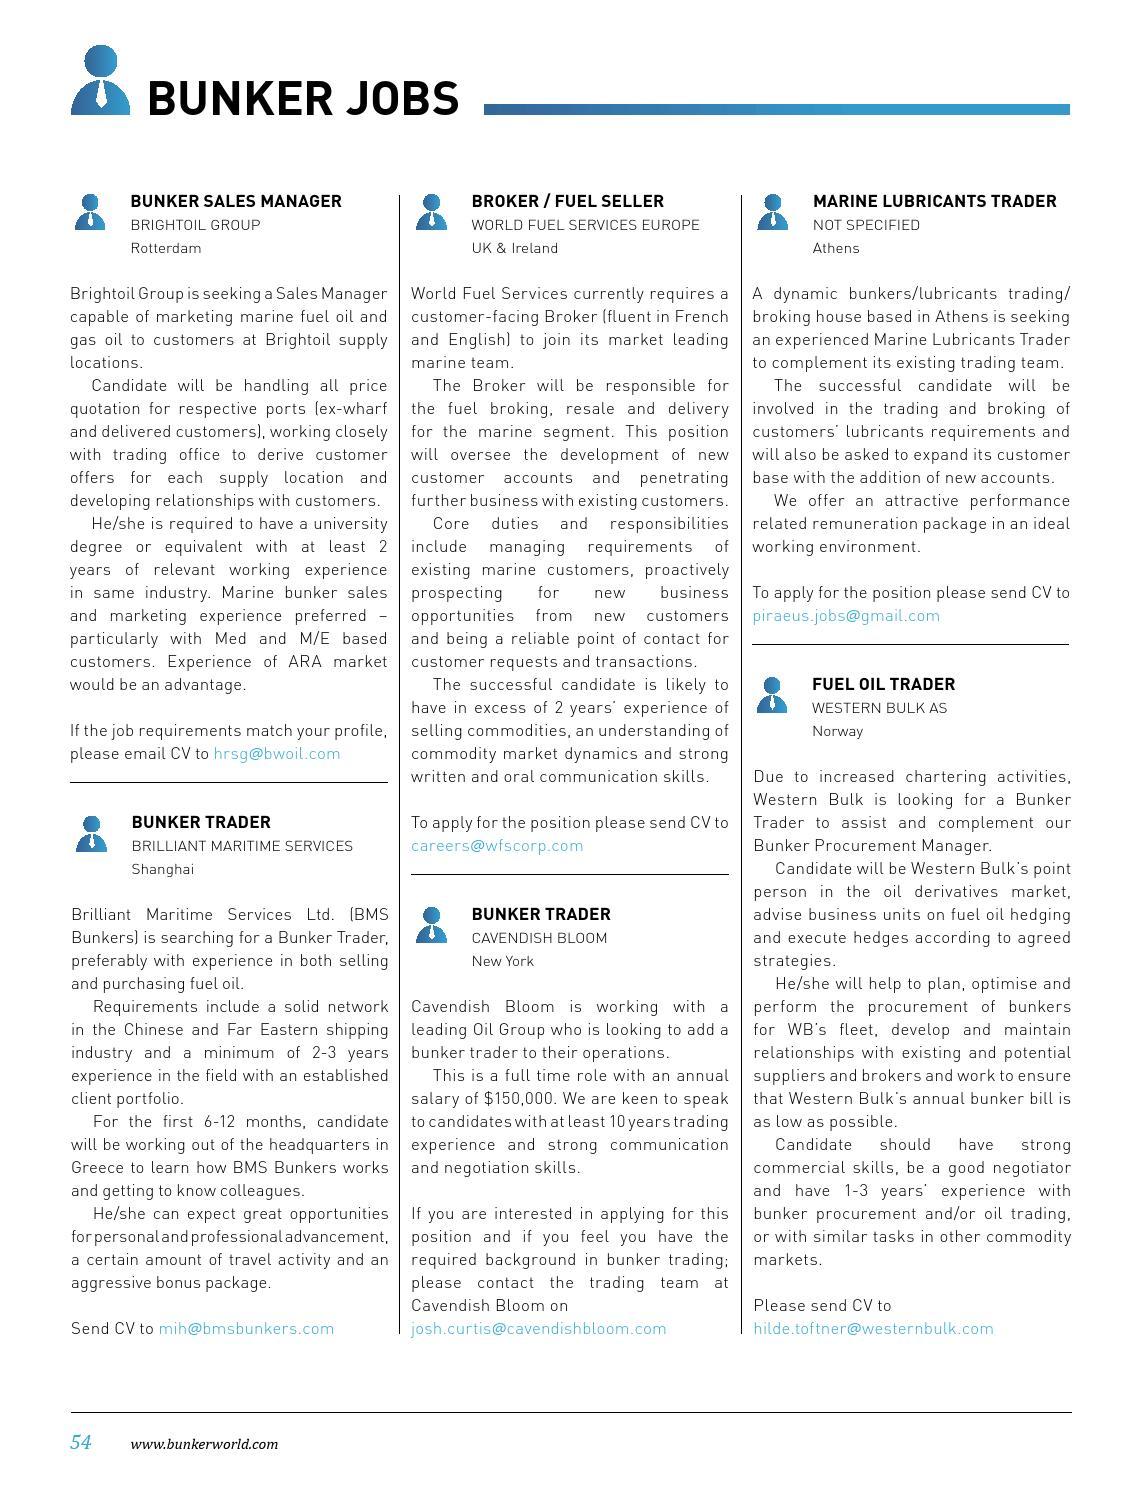 Bunker Bulletin, Feb 2013 Edition by Petromedia Ltd - issuu